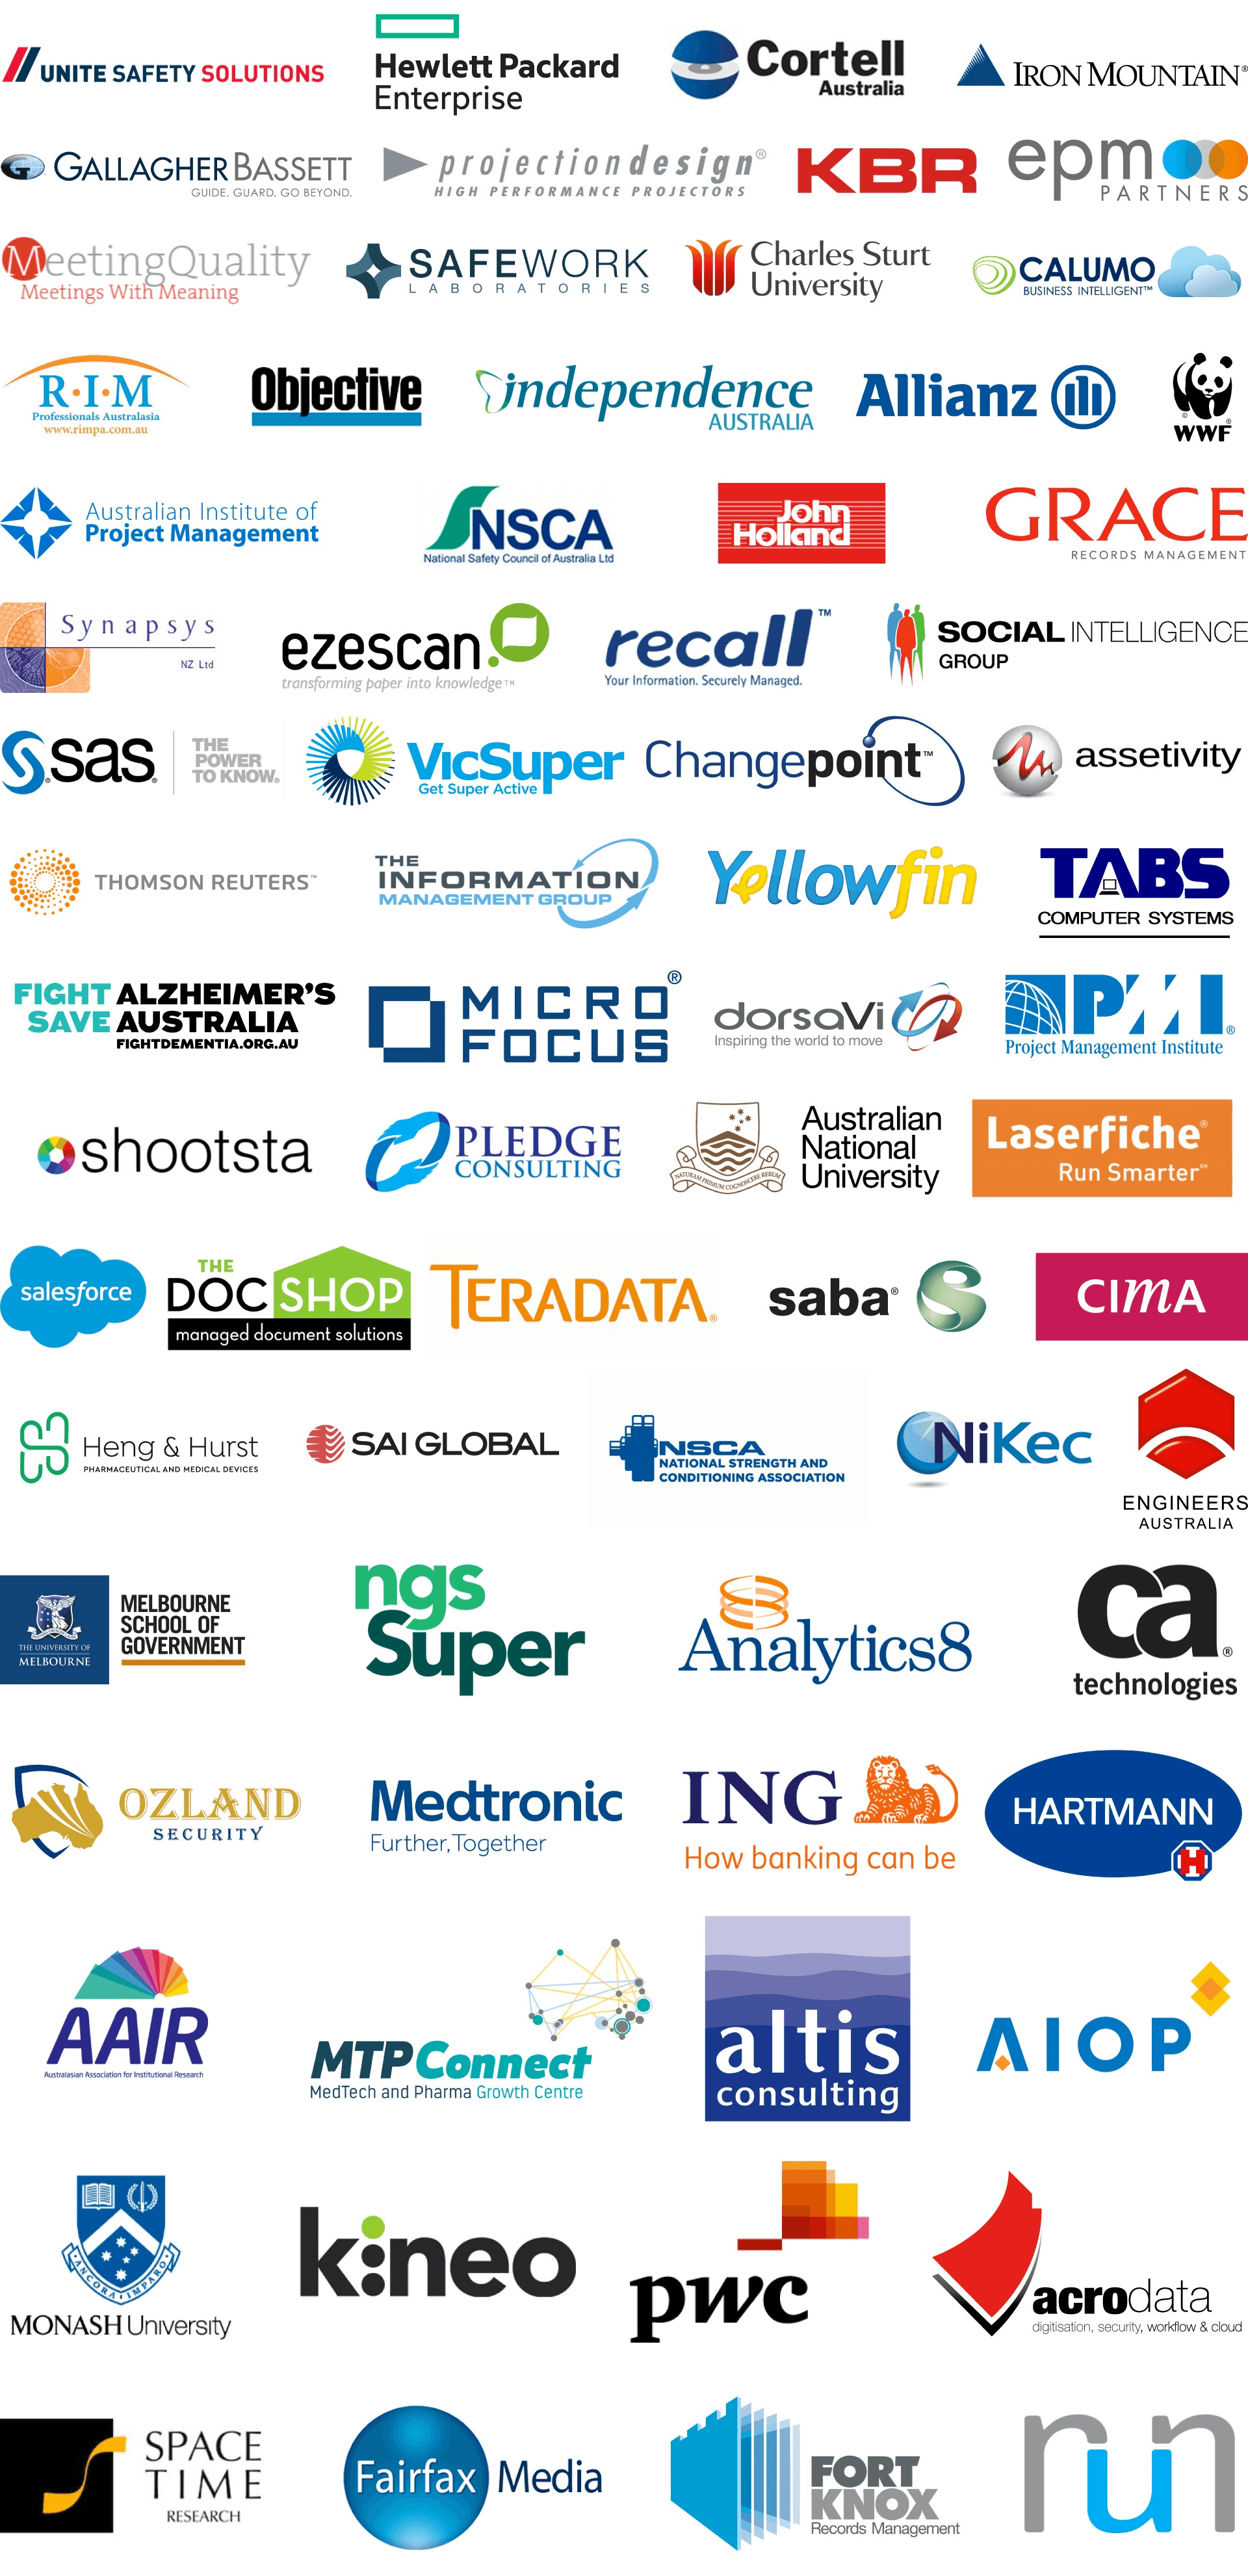 Many sponsor logos